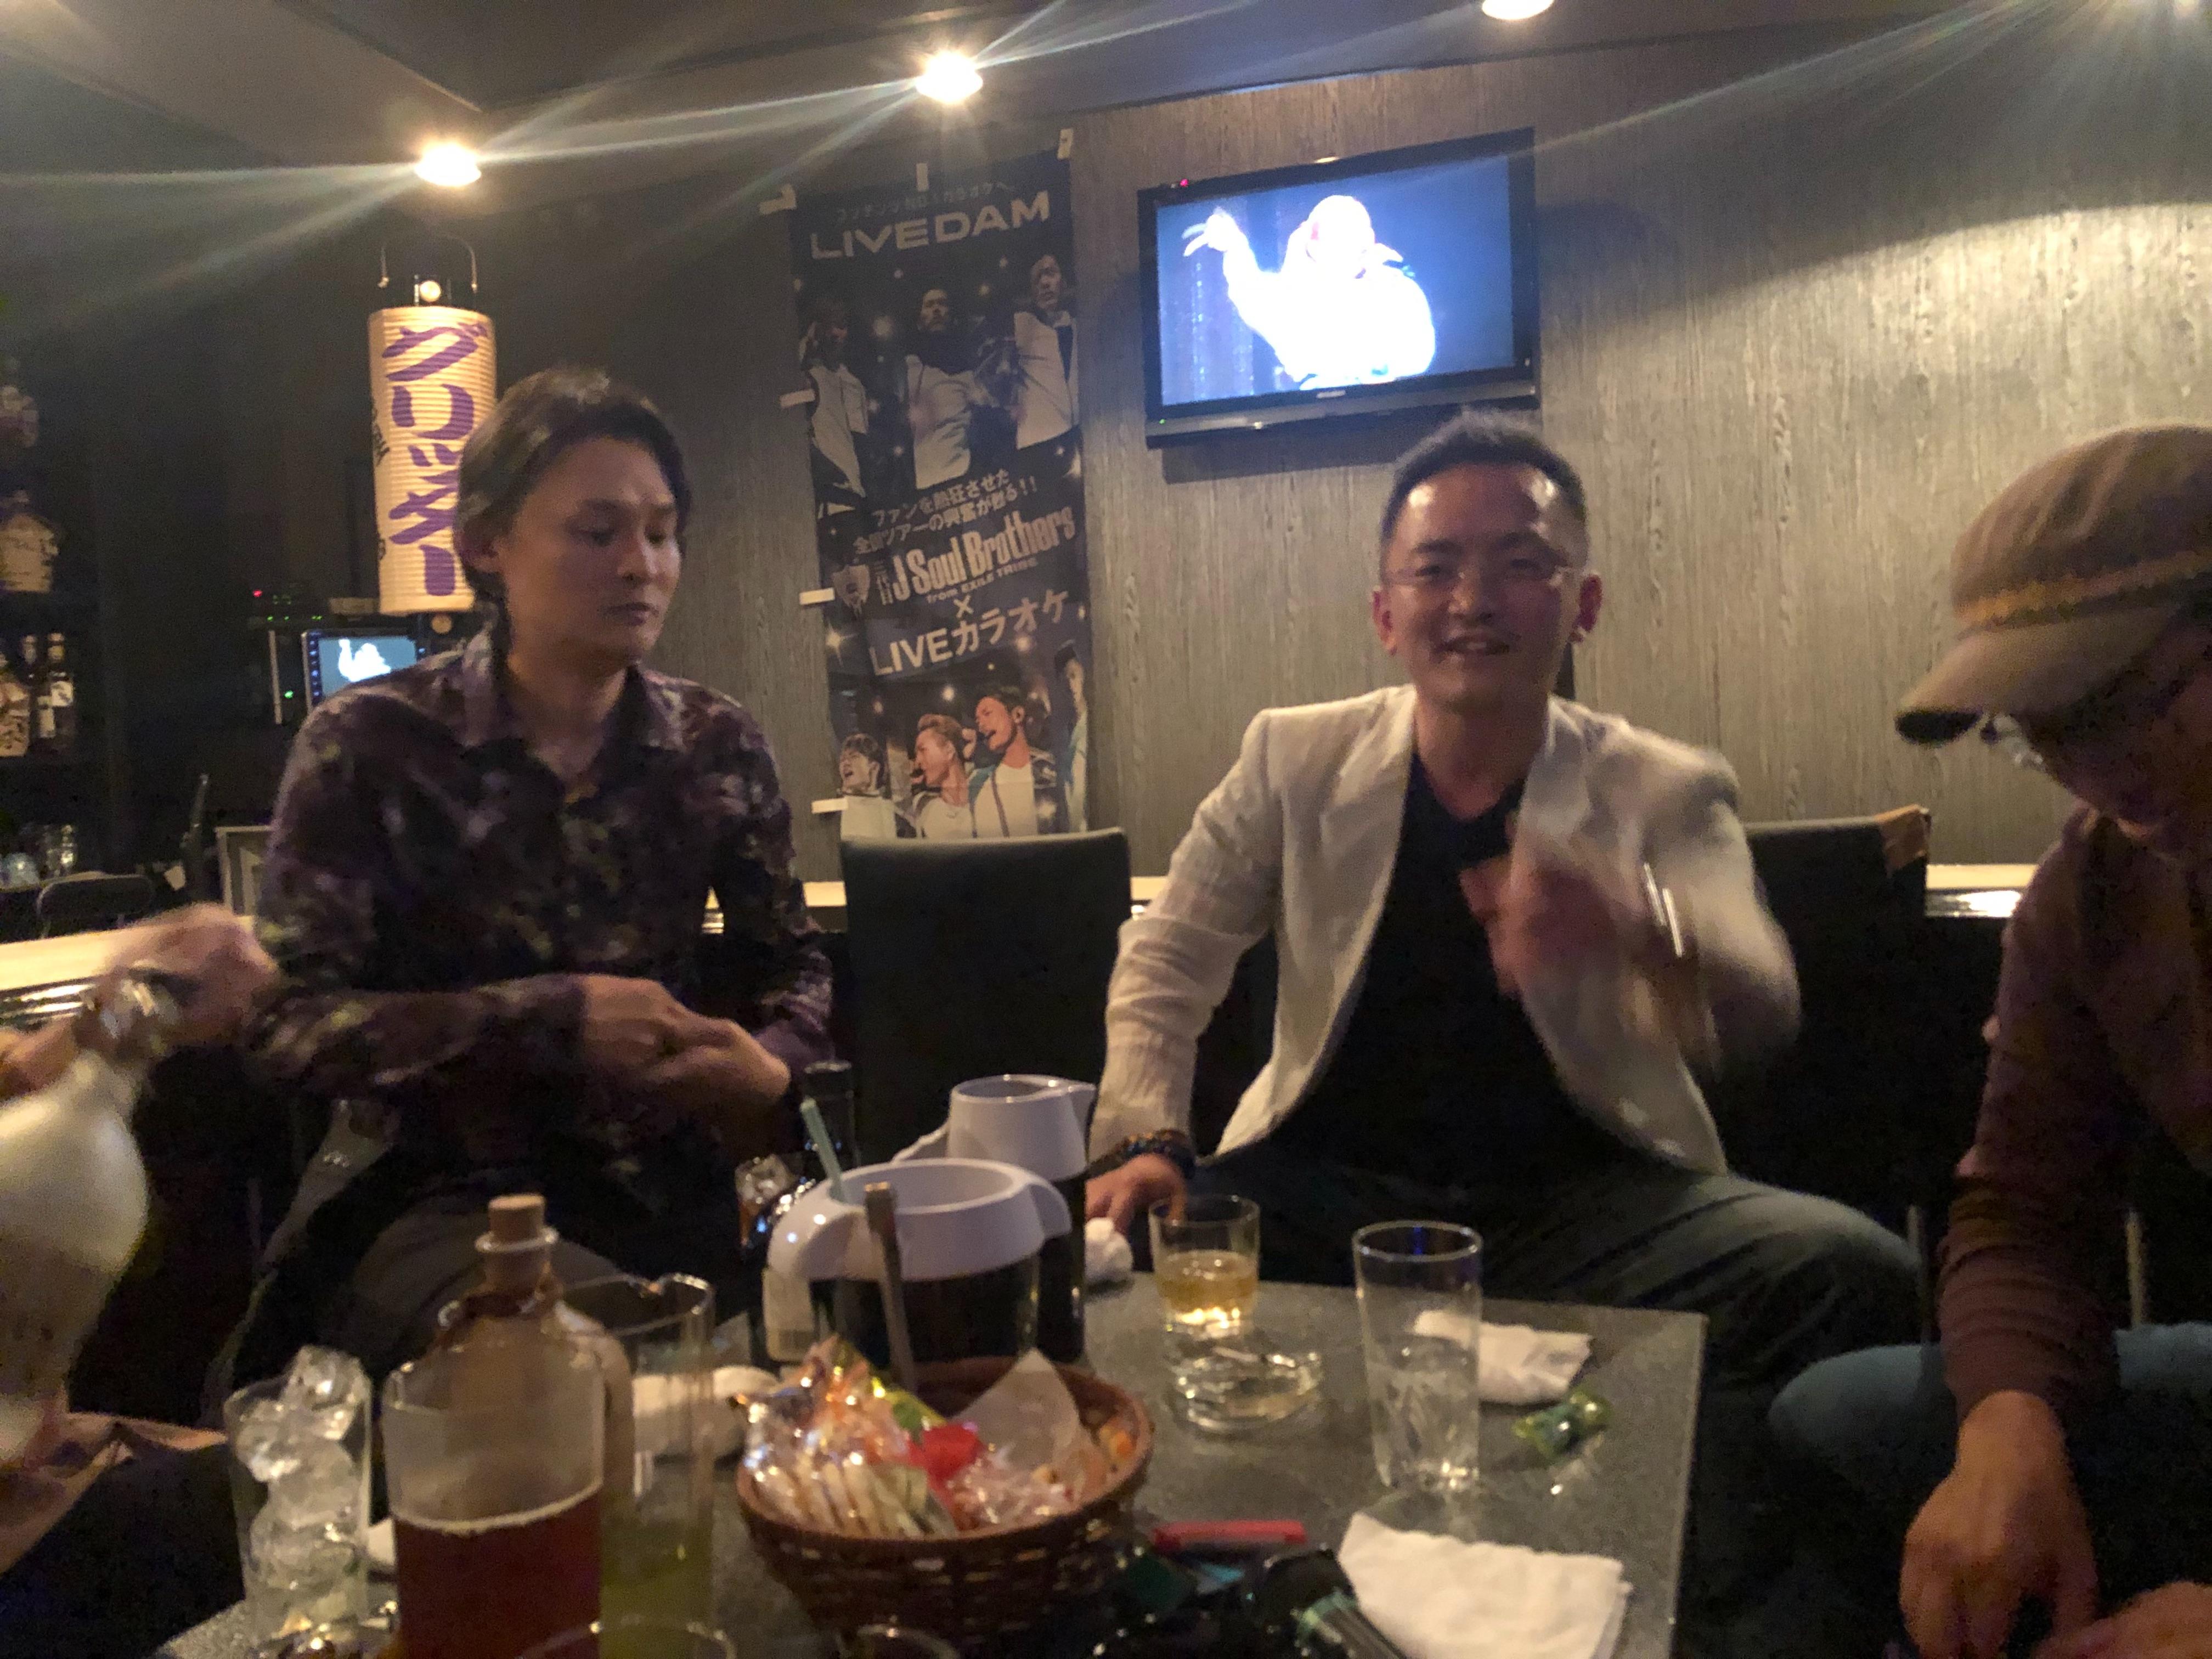 f:id:masanori-kato1972:20190525172845j:image